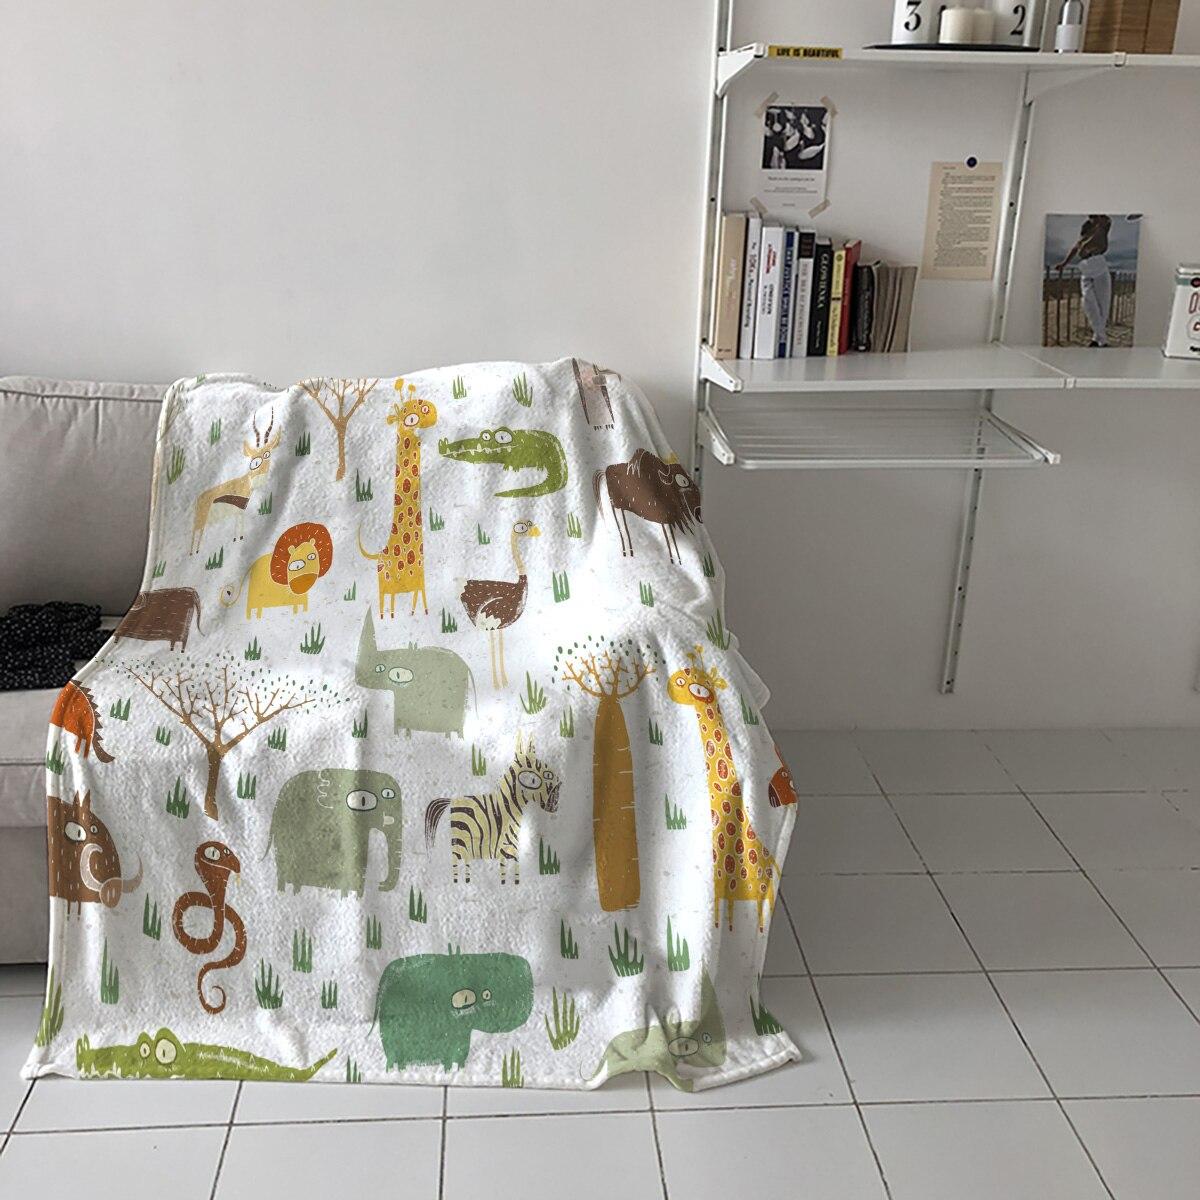 Special Throw Blanket For Bed Elephant Giraffe Cartoon Nap Traveling Soft Flannel Blanket Children's Bedroom Bedspreadc